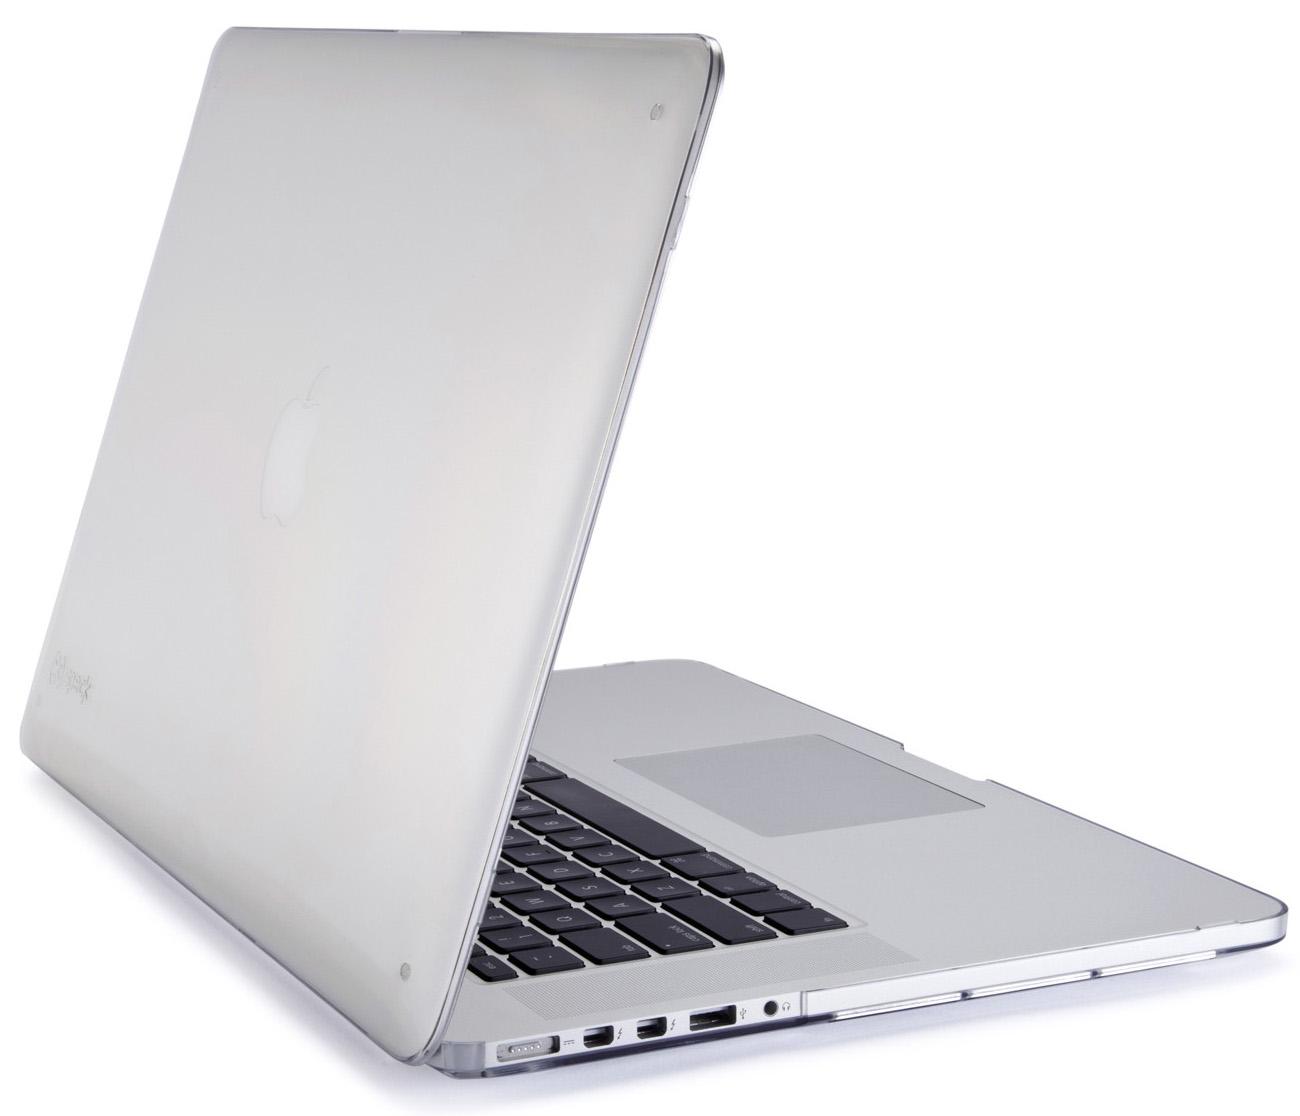 Protective CaseНакладки для Macbook<br>Чехол-накладка<br>